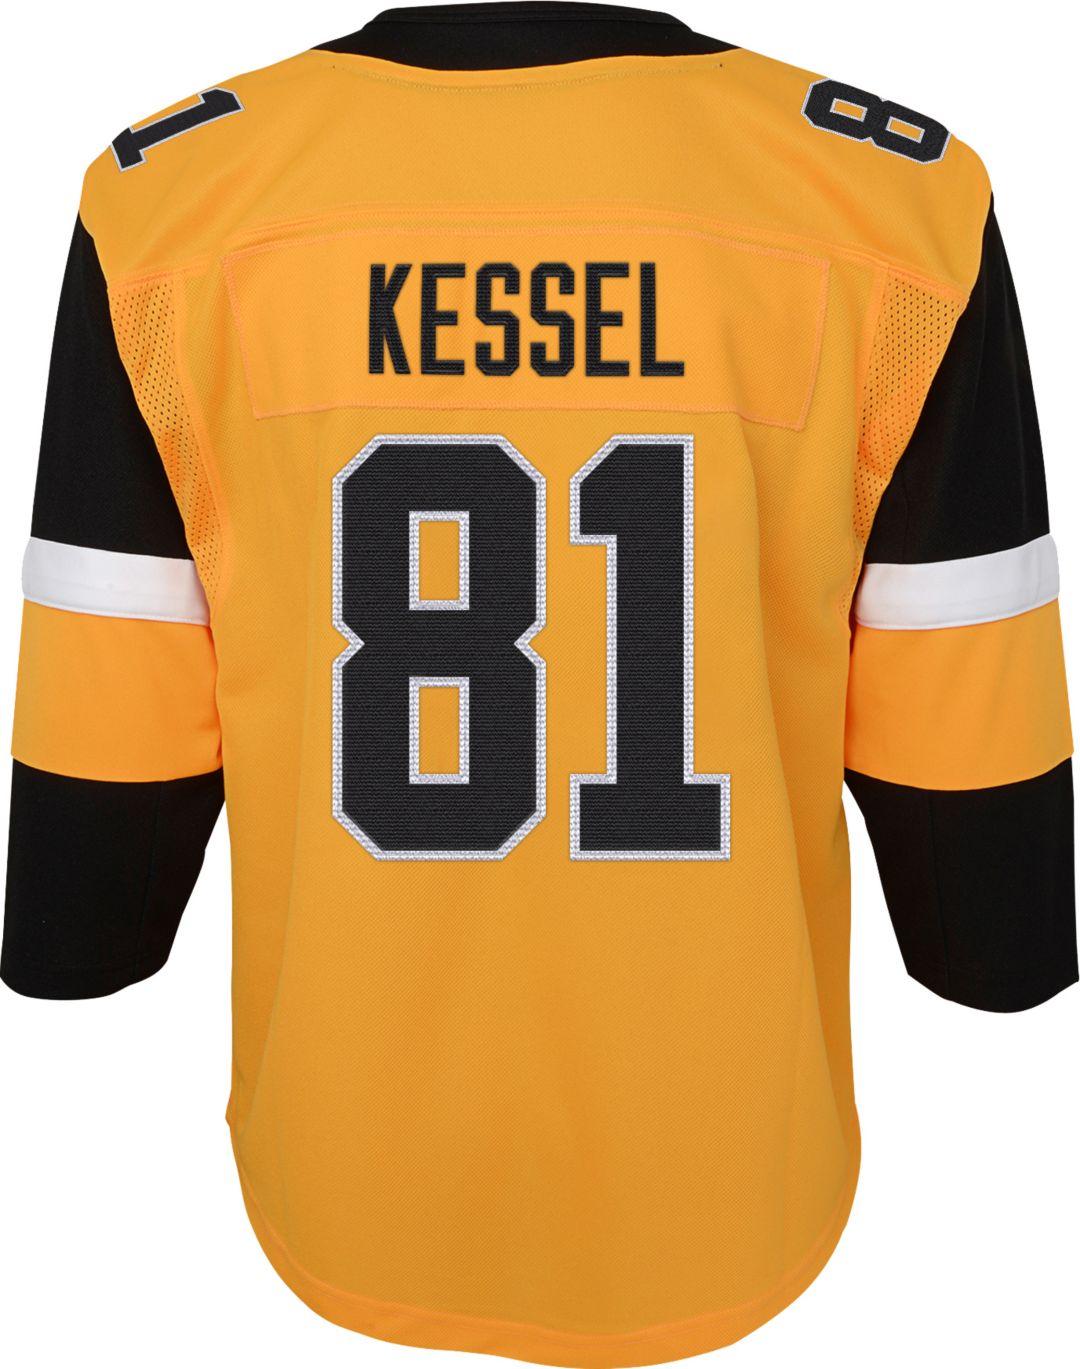 buy popular f9117 2bc62 NHL Youth Pittsburgh Penguins Phil Kessel #81 Premium Alternate Jersey